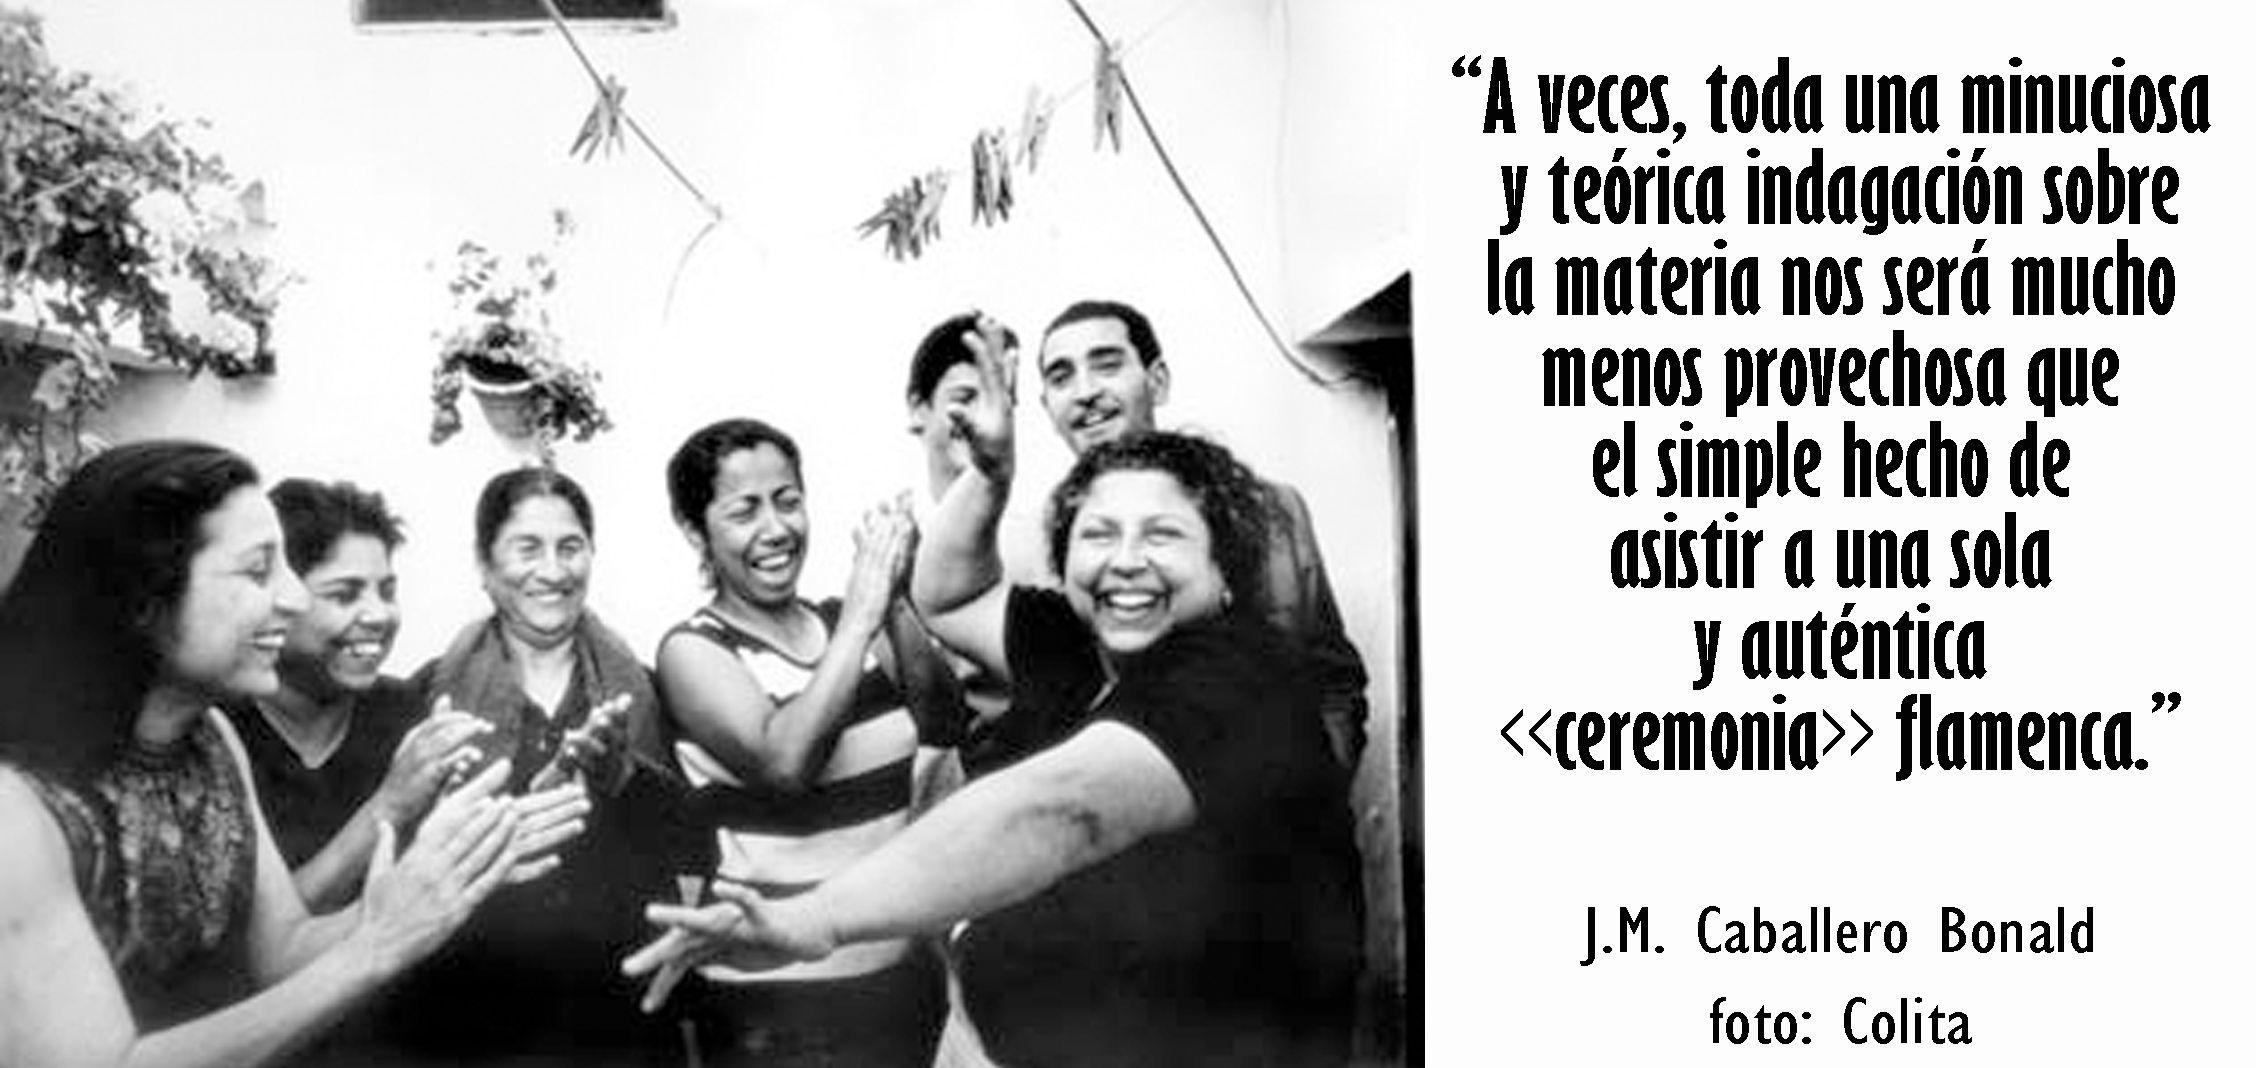 Ceremonia Flamenca Fernanda Y Bernarda De Utrera Cita Quote Frase